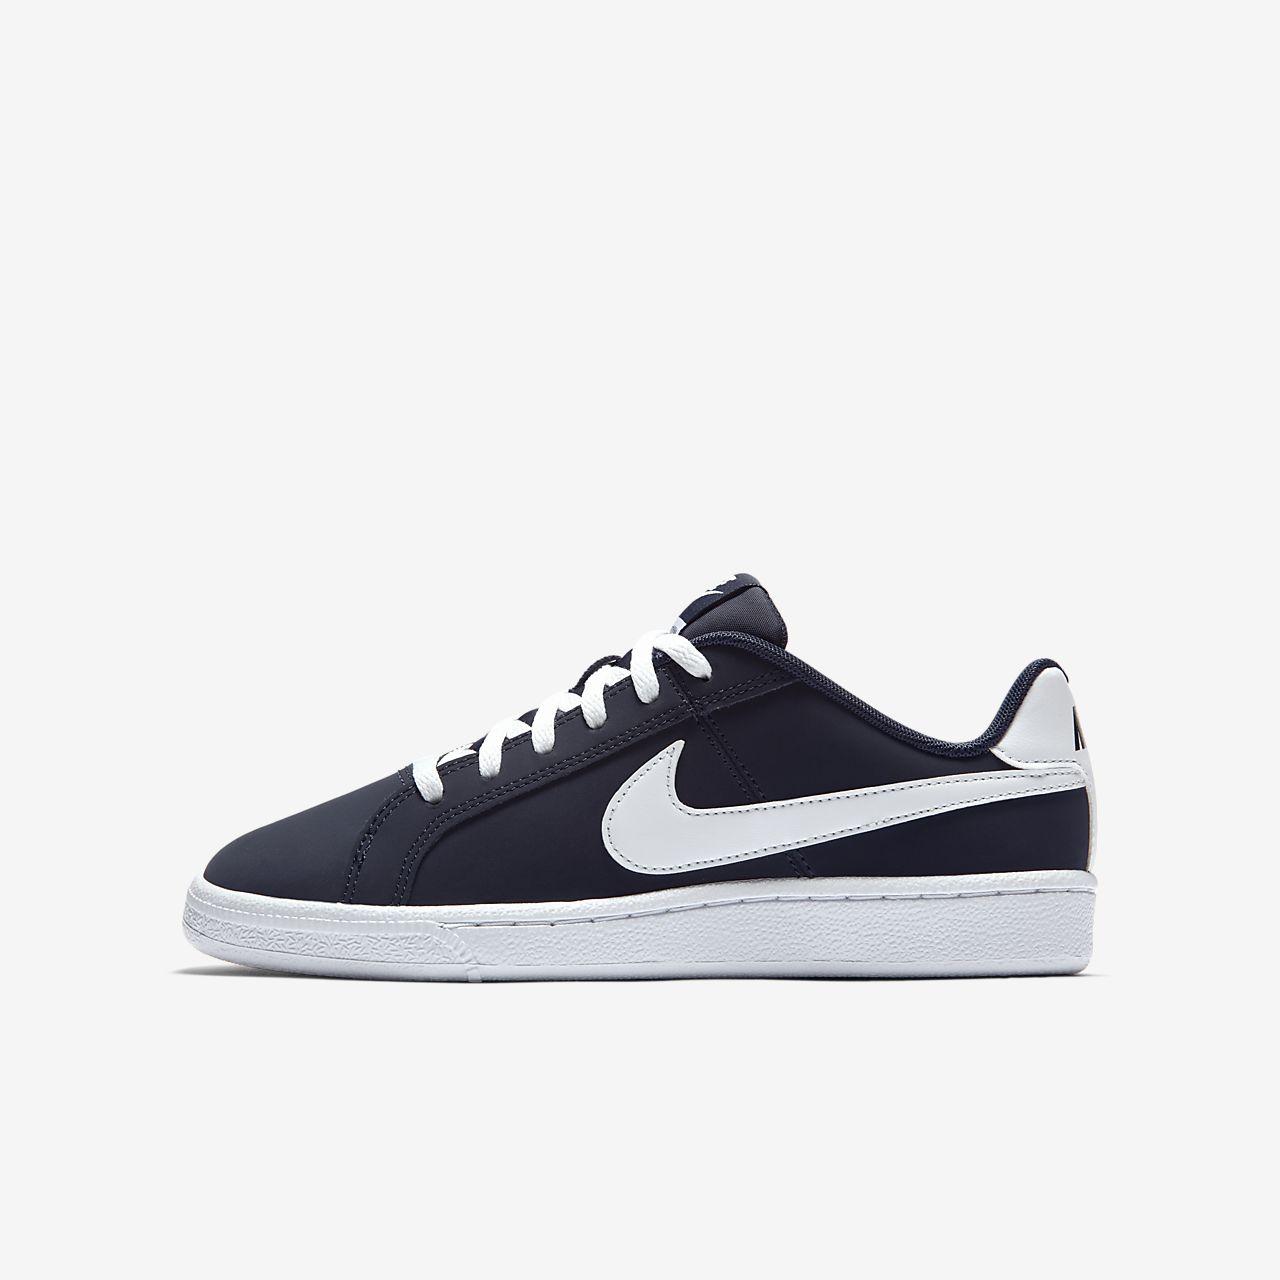 NikeCourt Royale Schuh für ältere Kinder